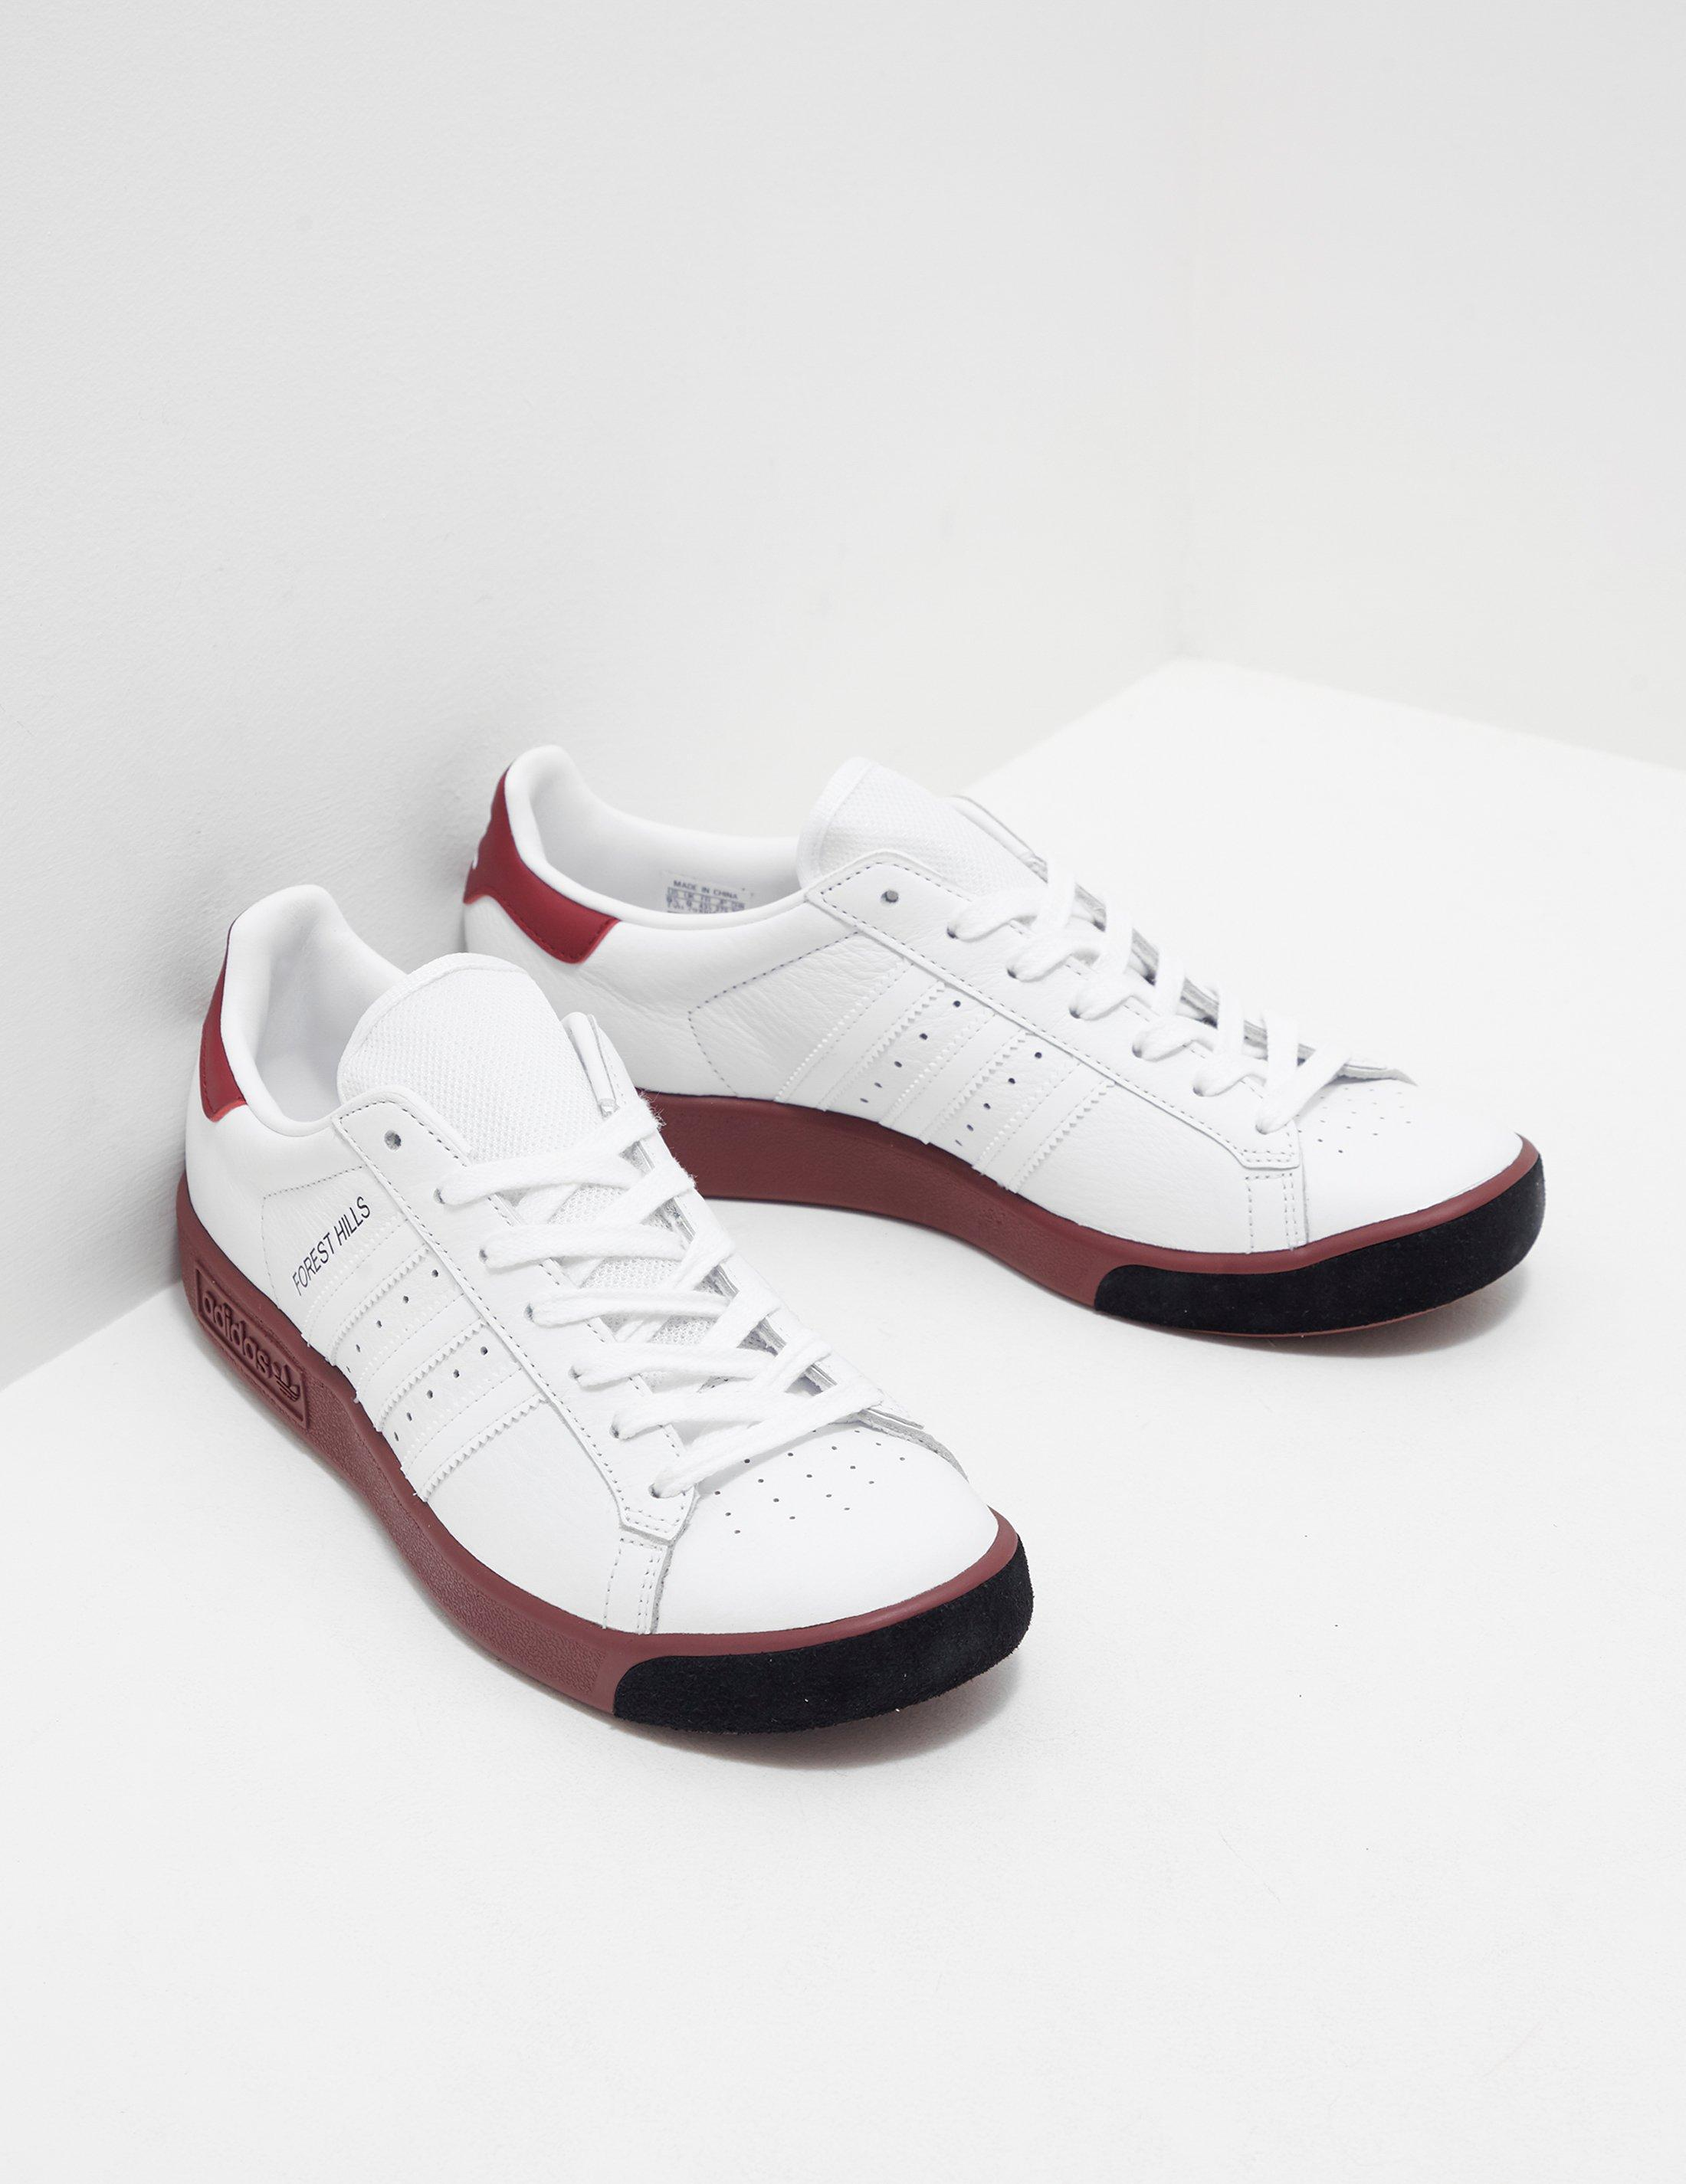 adidas Originals forest hills unisex sneakers